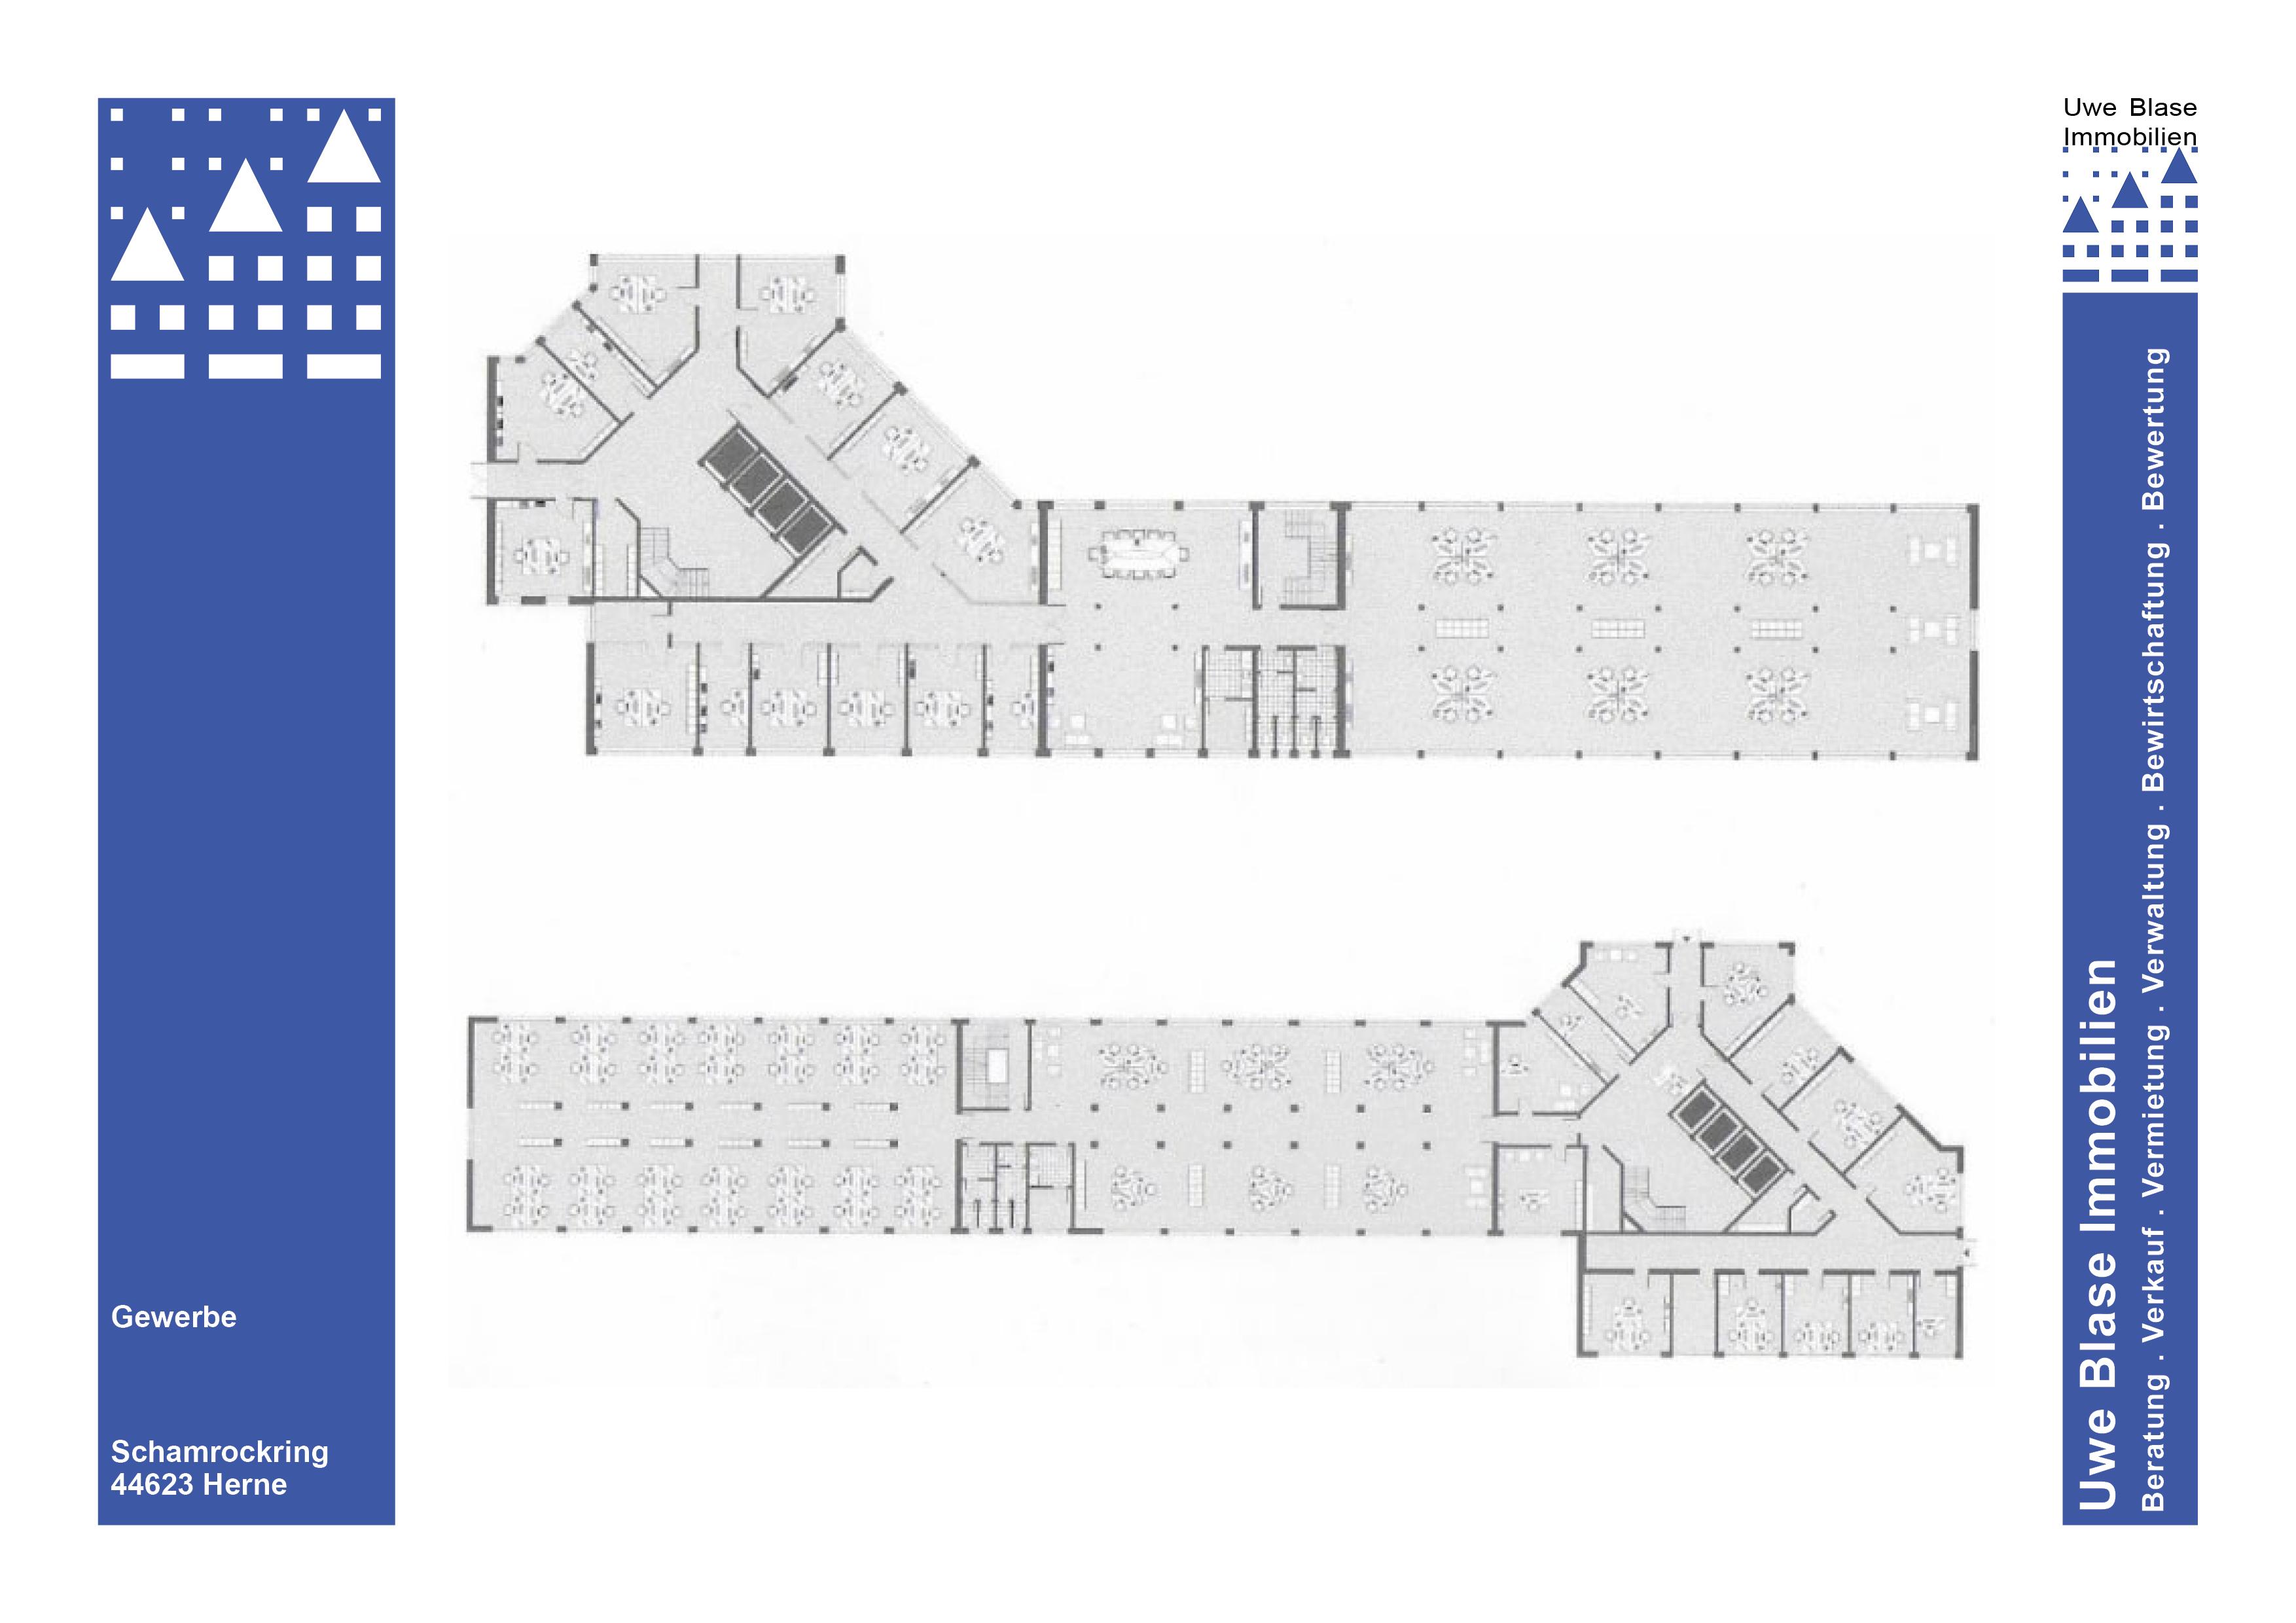 Haus 4: 7-geschossiges Bürogebäude